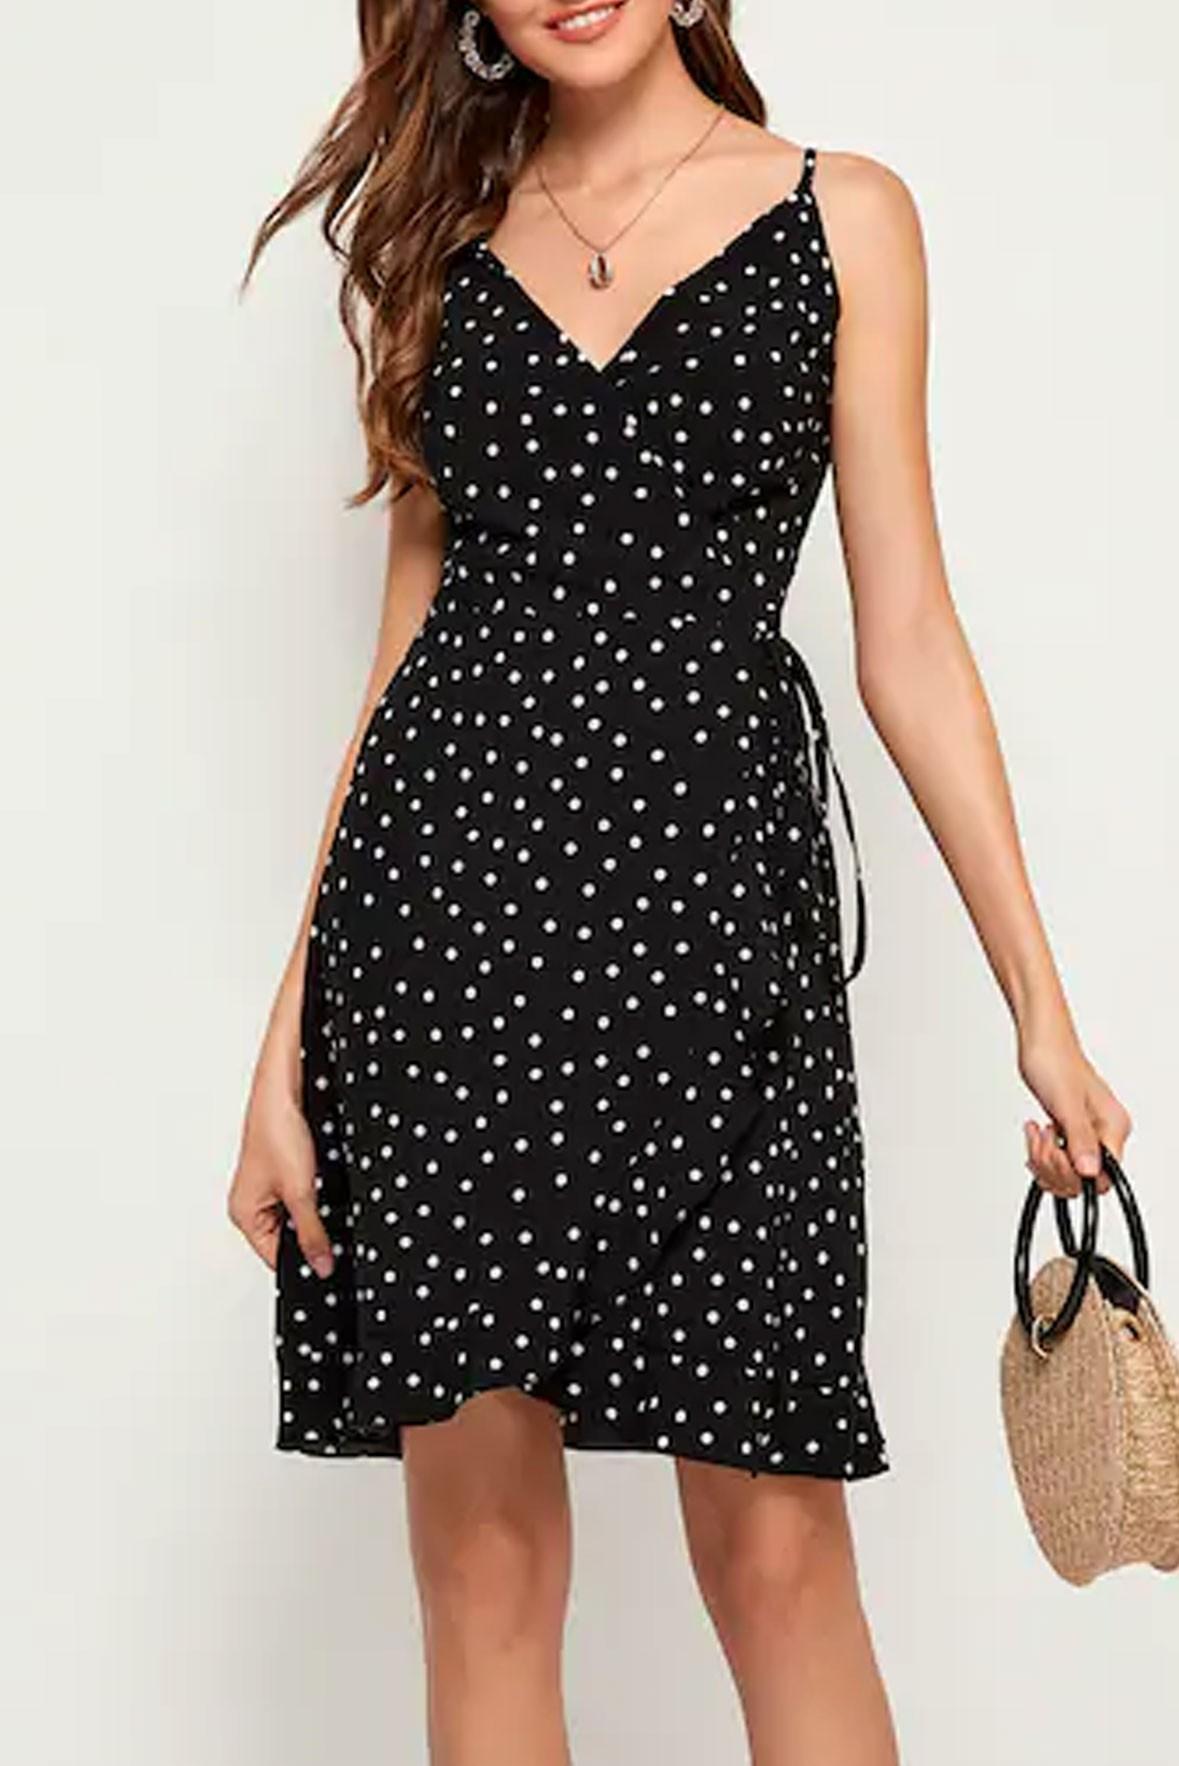 Polka Dot Print Cami Dress Black